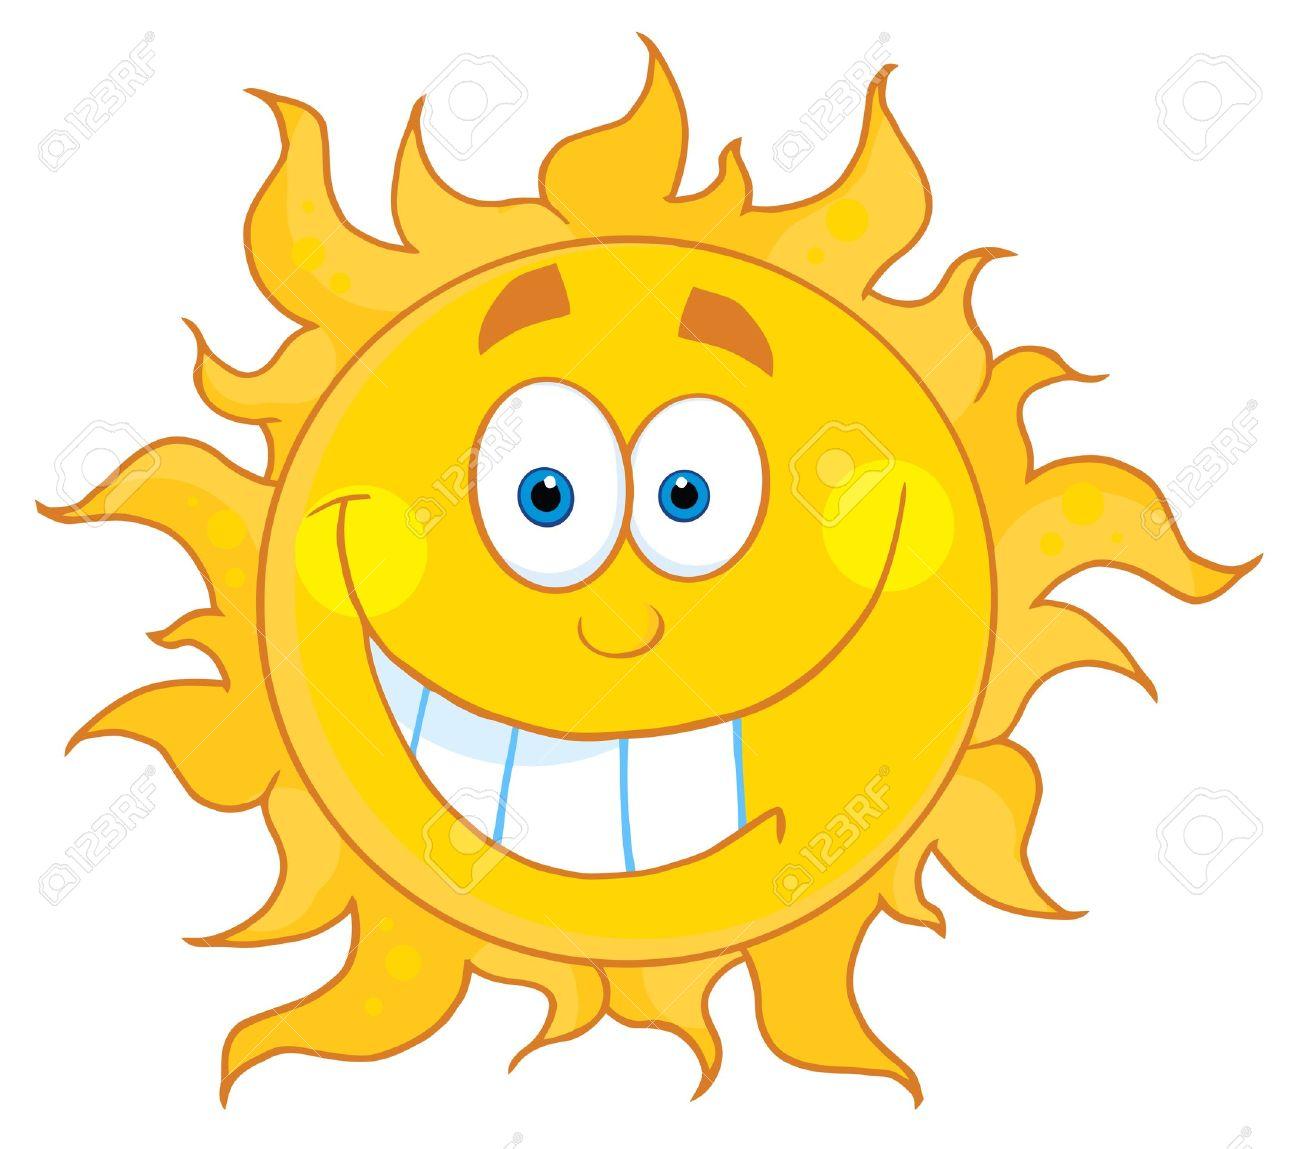 Happy Smiling Sun Mascot Cartoon Character Stock Vector - 8930293